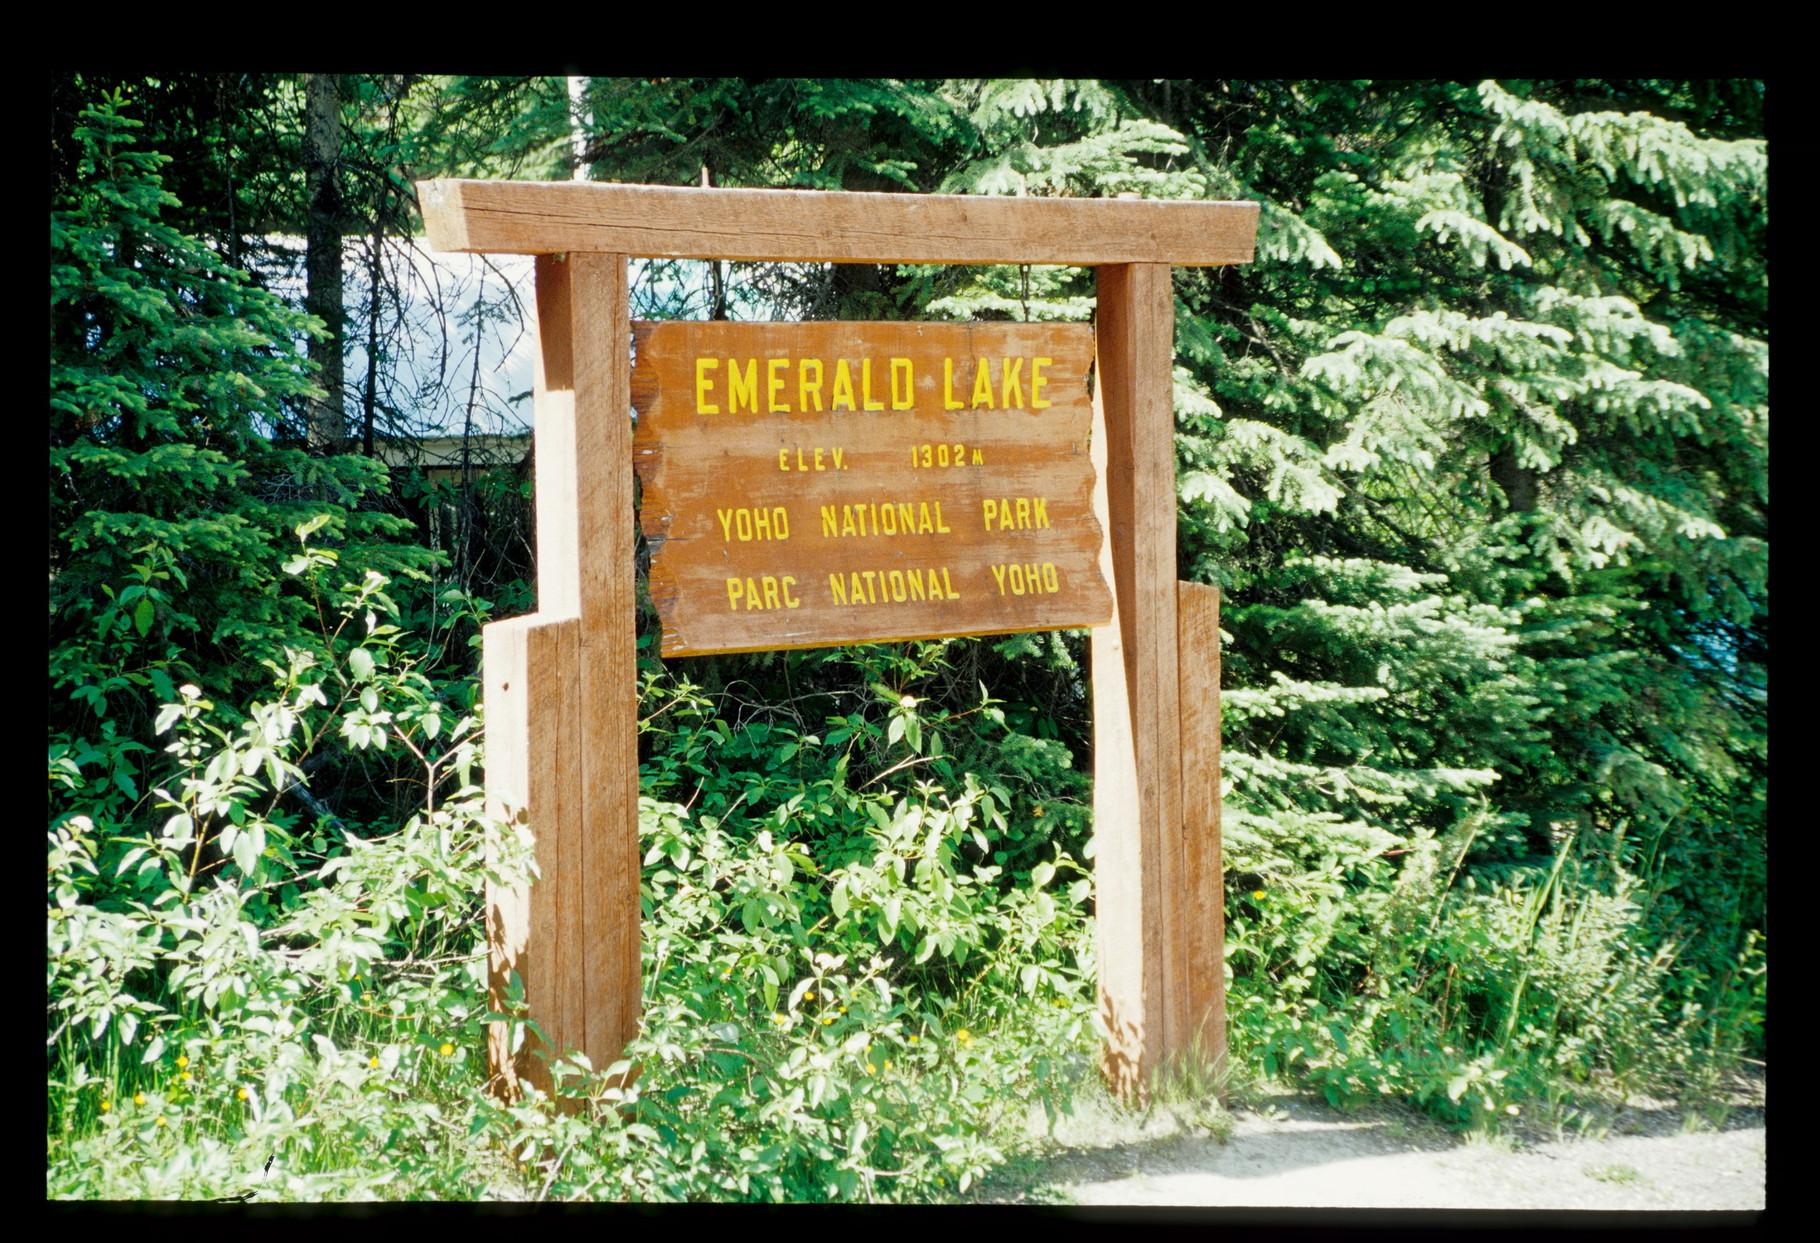 Emerald Lake I